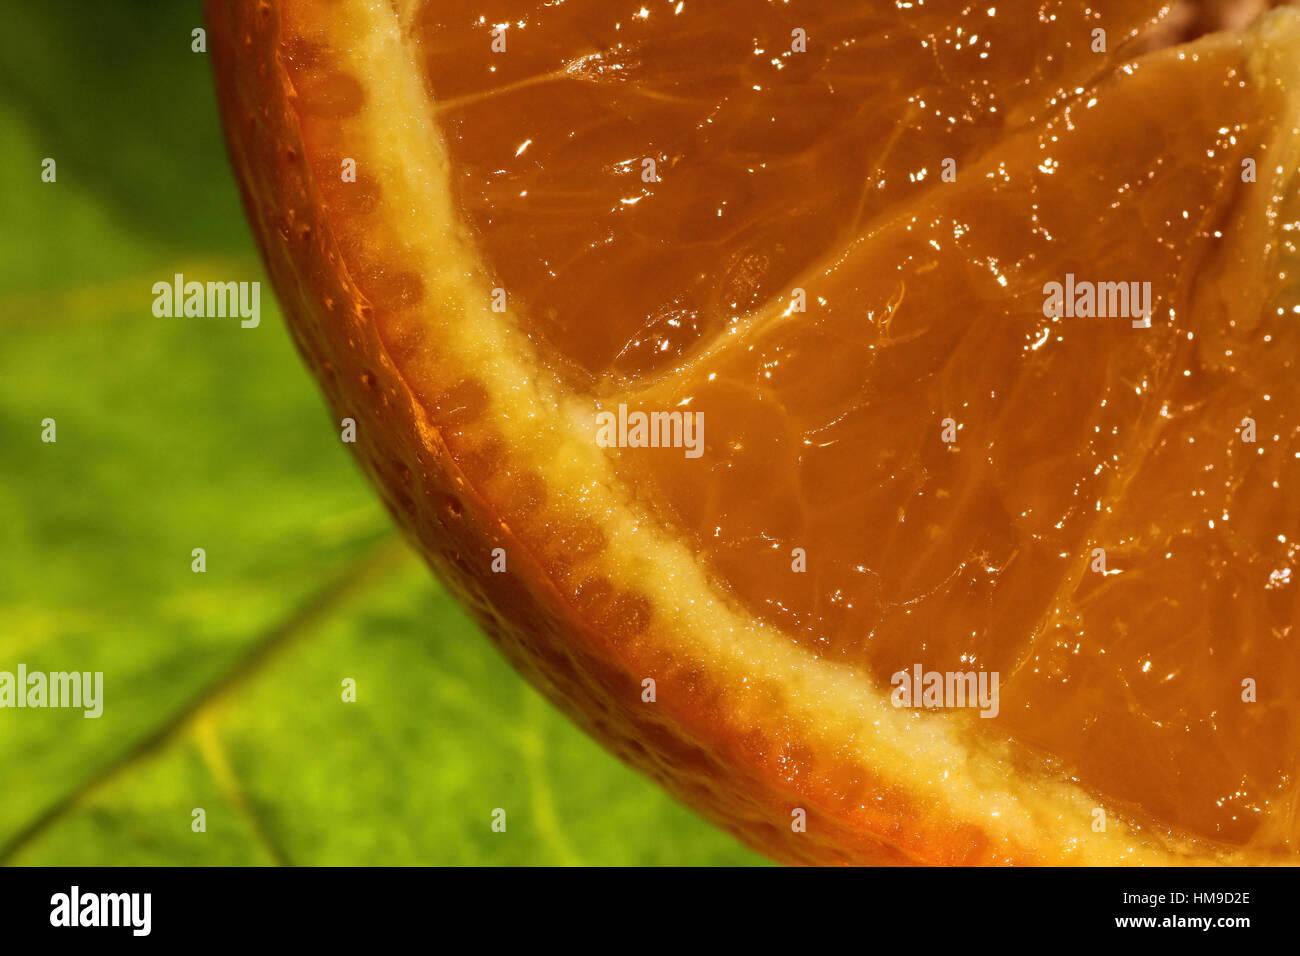 Sed apetitosos naranja arriba cerrar Imagen De Stock